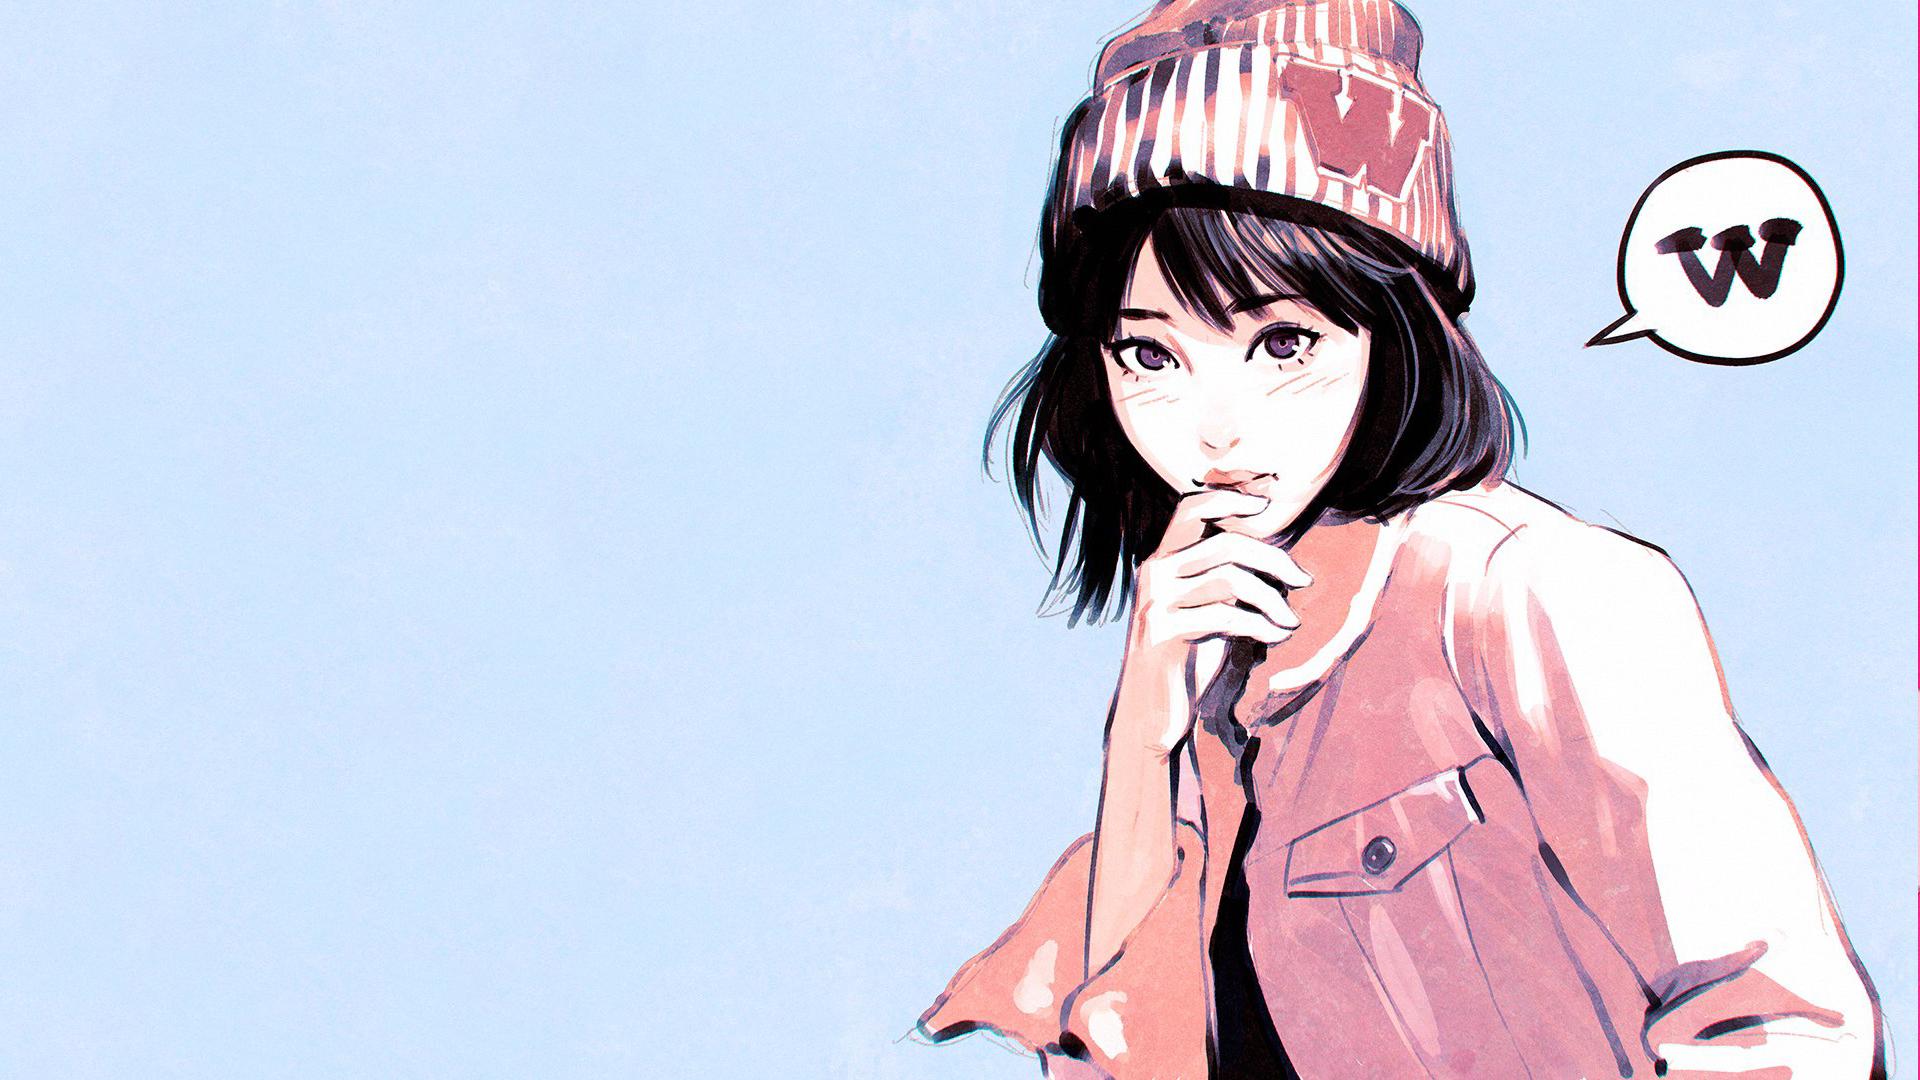 Fondos De Pantalla Ilustracion Mujer Anime Obra De Arte